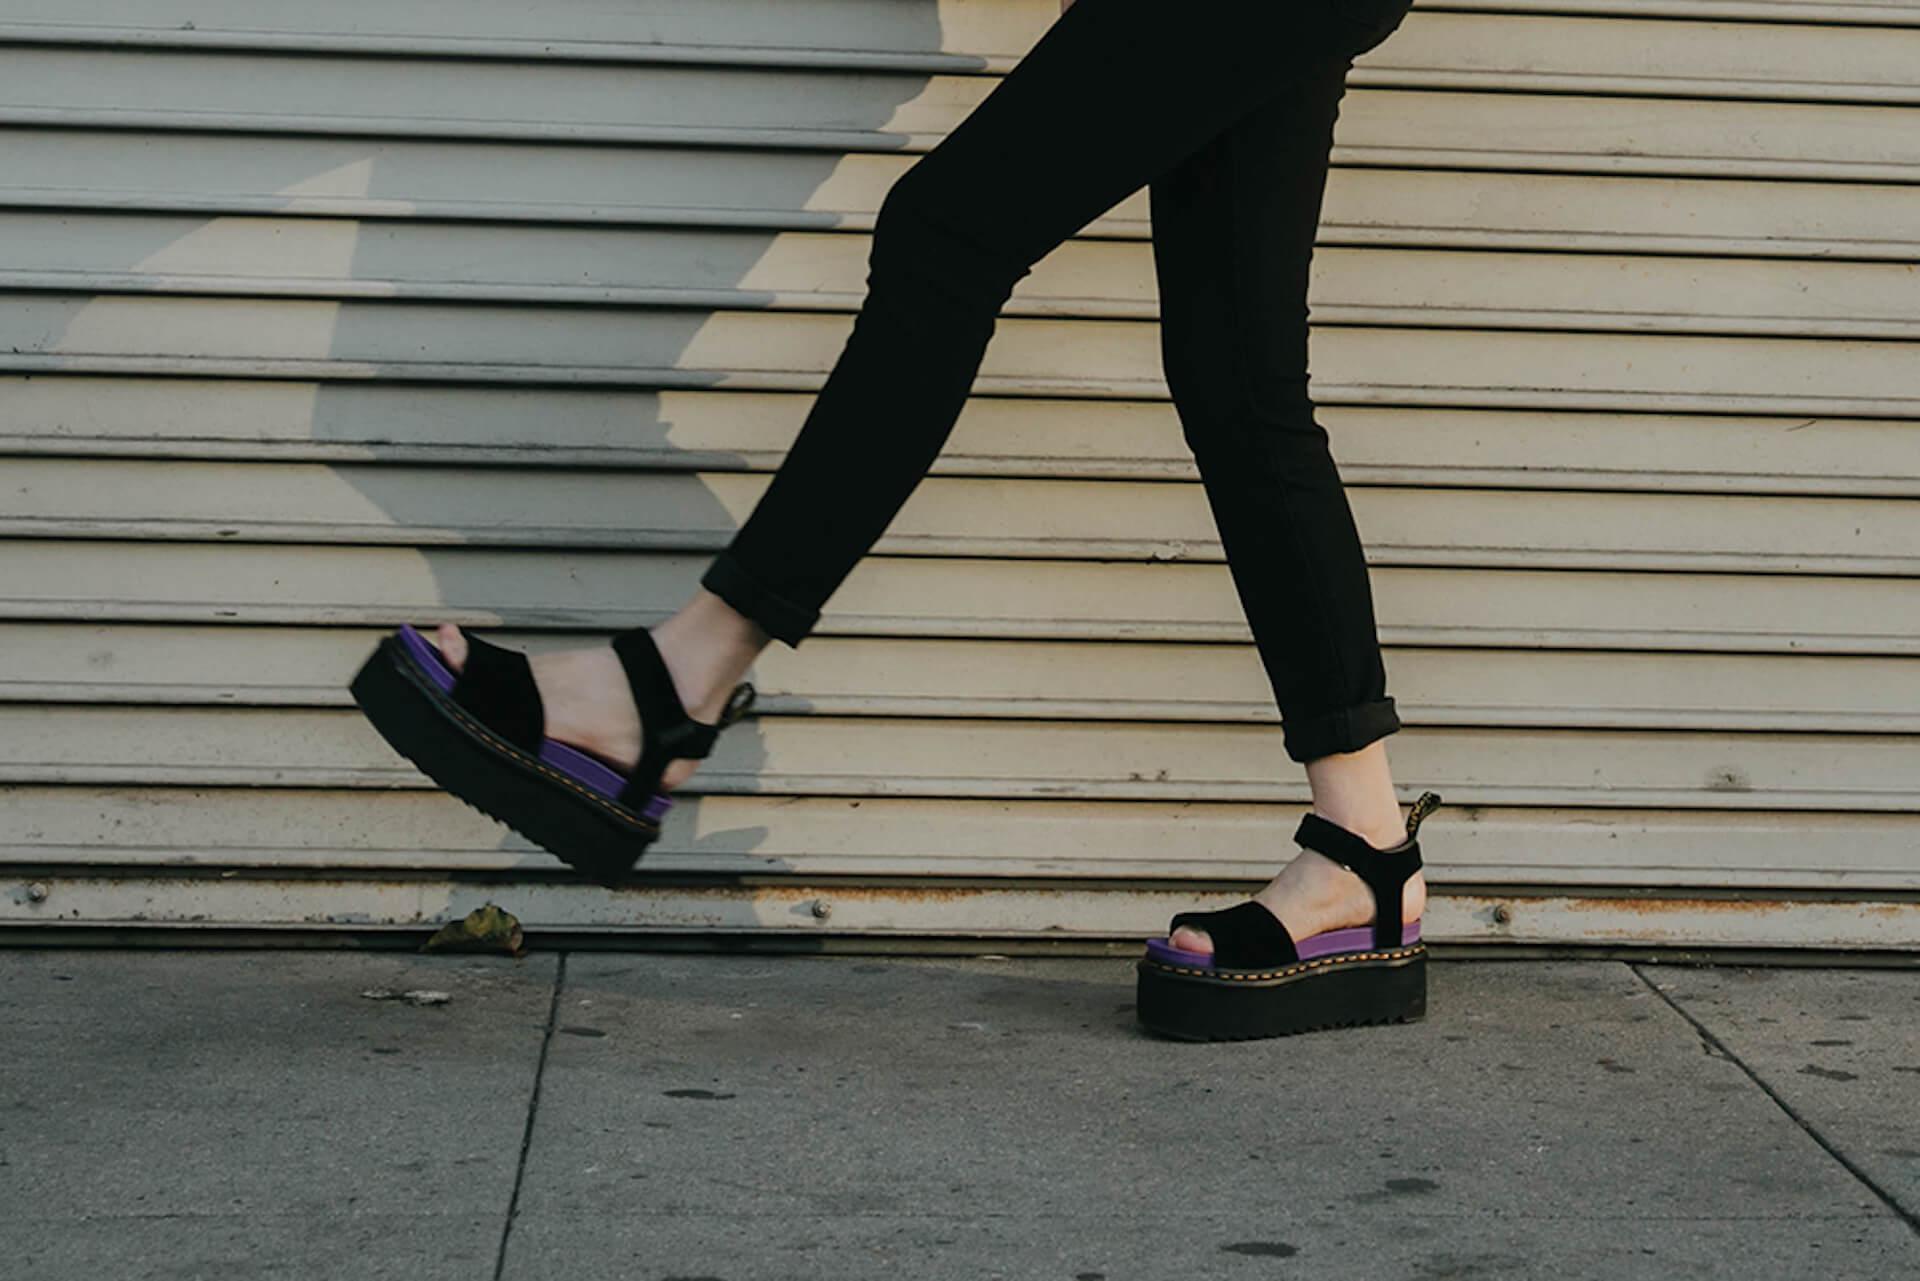 Dr.MartensとX-girlが2度目のコラボコレクションを発表!定番厚底ブーツ&厚底サンダルをベースにした2モデル fation210607_DR.MARTENS-x-X-GIRL-10